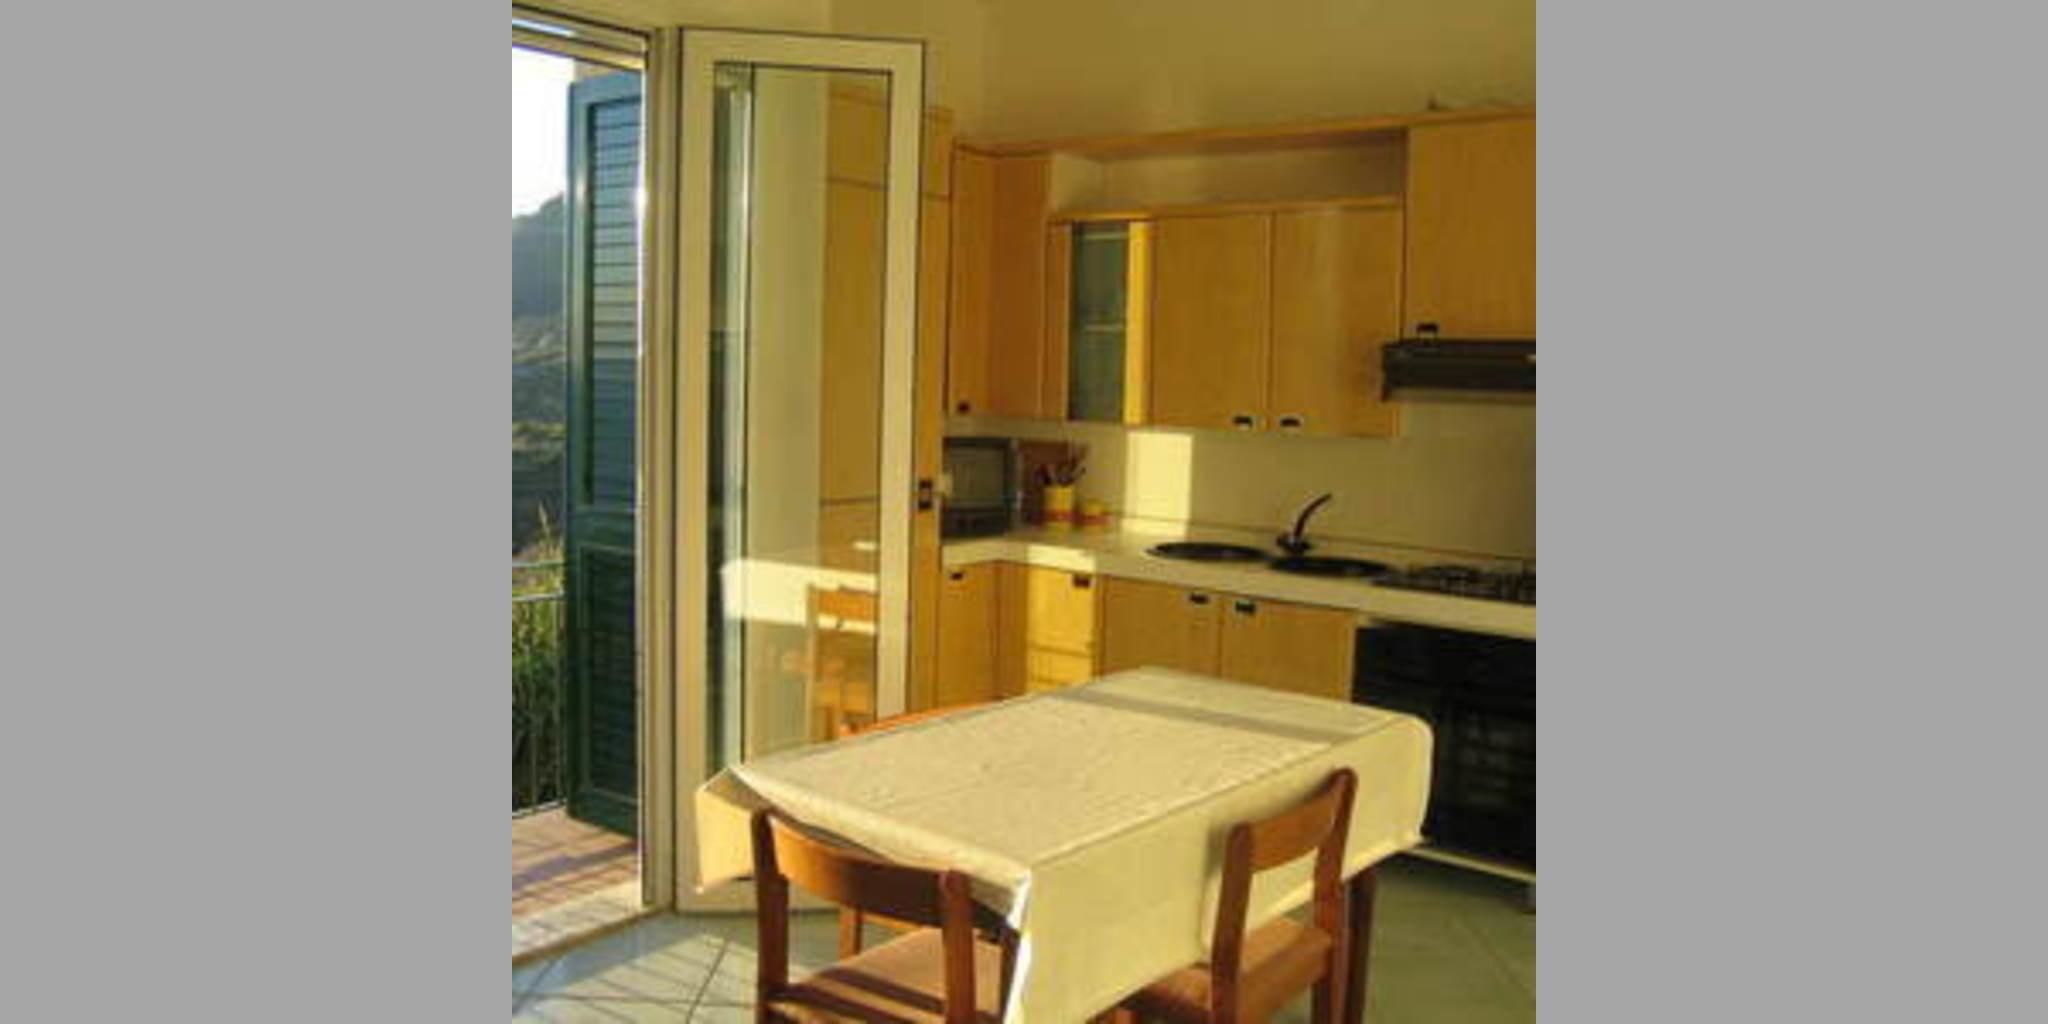 Apartment Barano D'Ischia - Barano D'ischia_Testaccio 2